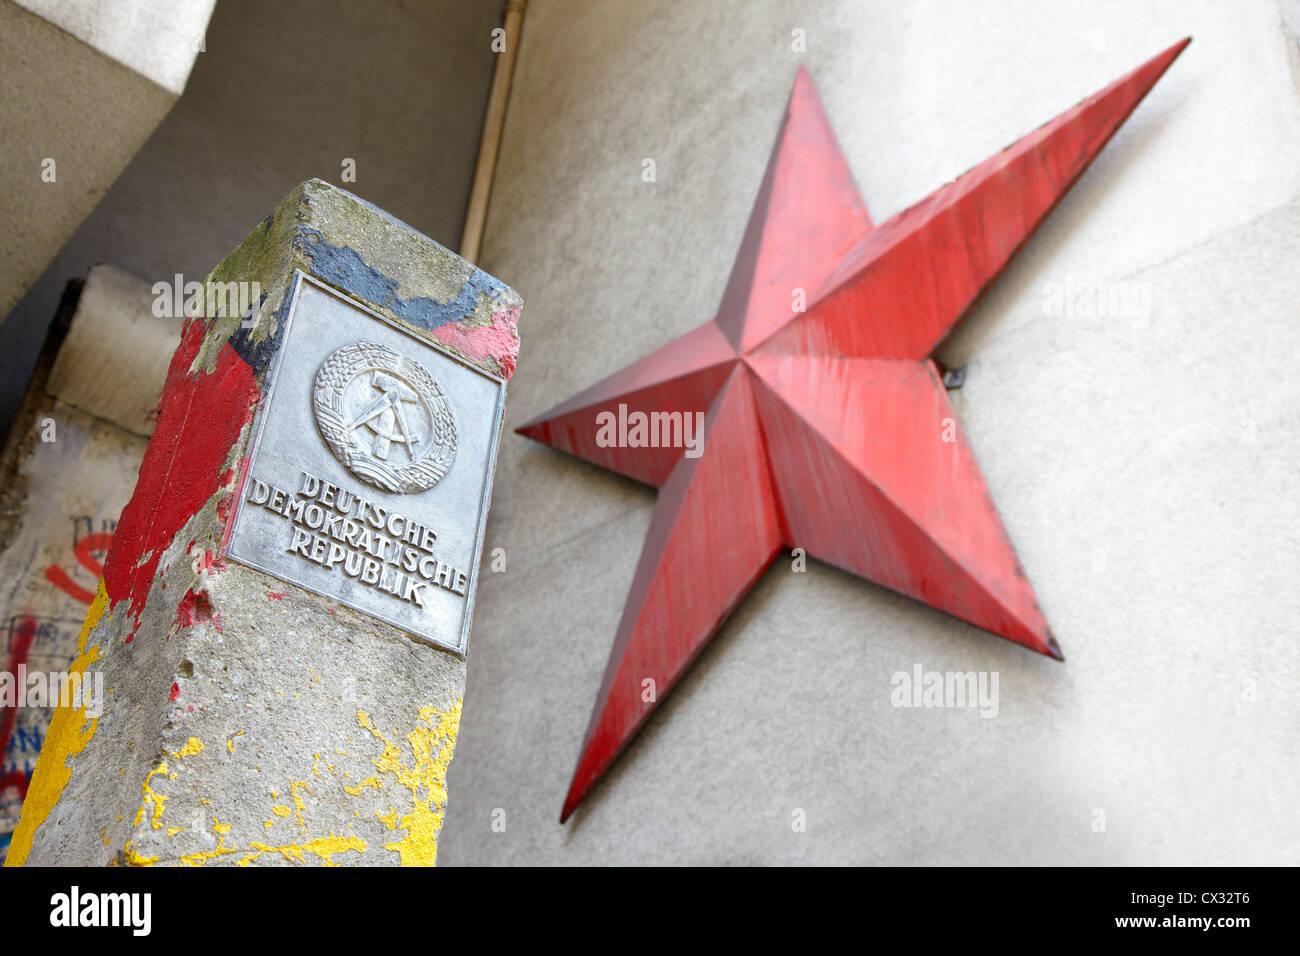 DDR firmar y estrella roja en Berlín. Foto de stock